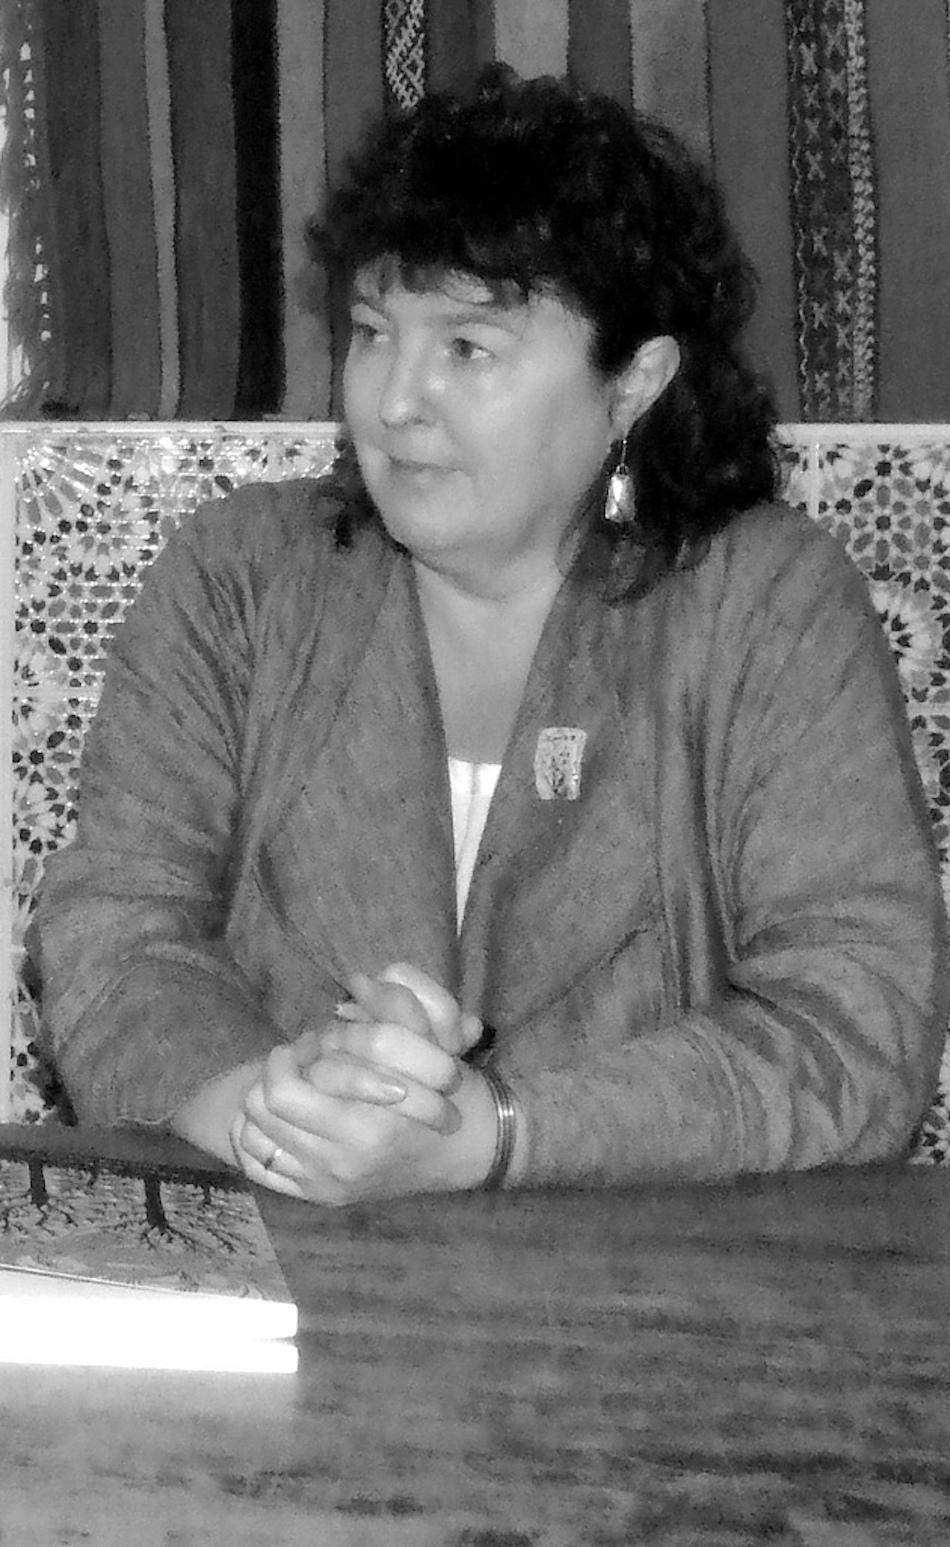 Portrait of Poet Carol Ann Duffy in 2009. (Image via Wikimedia Commons)